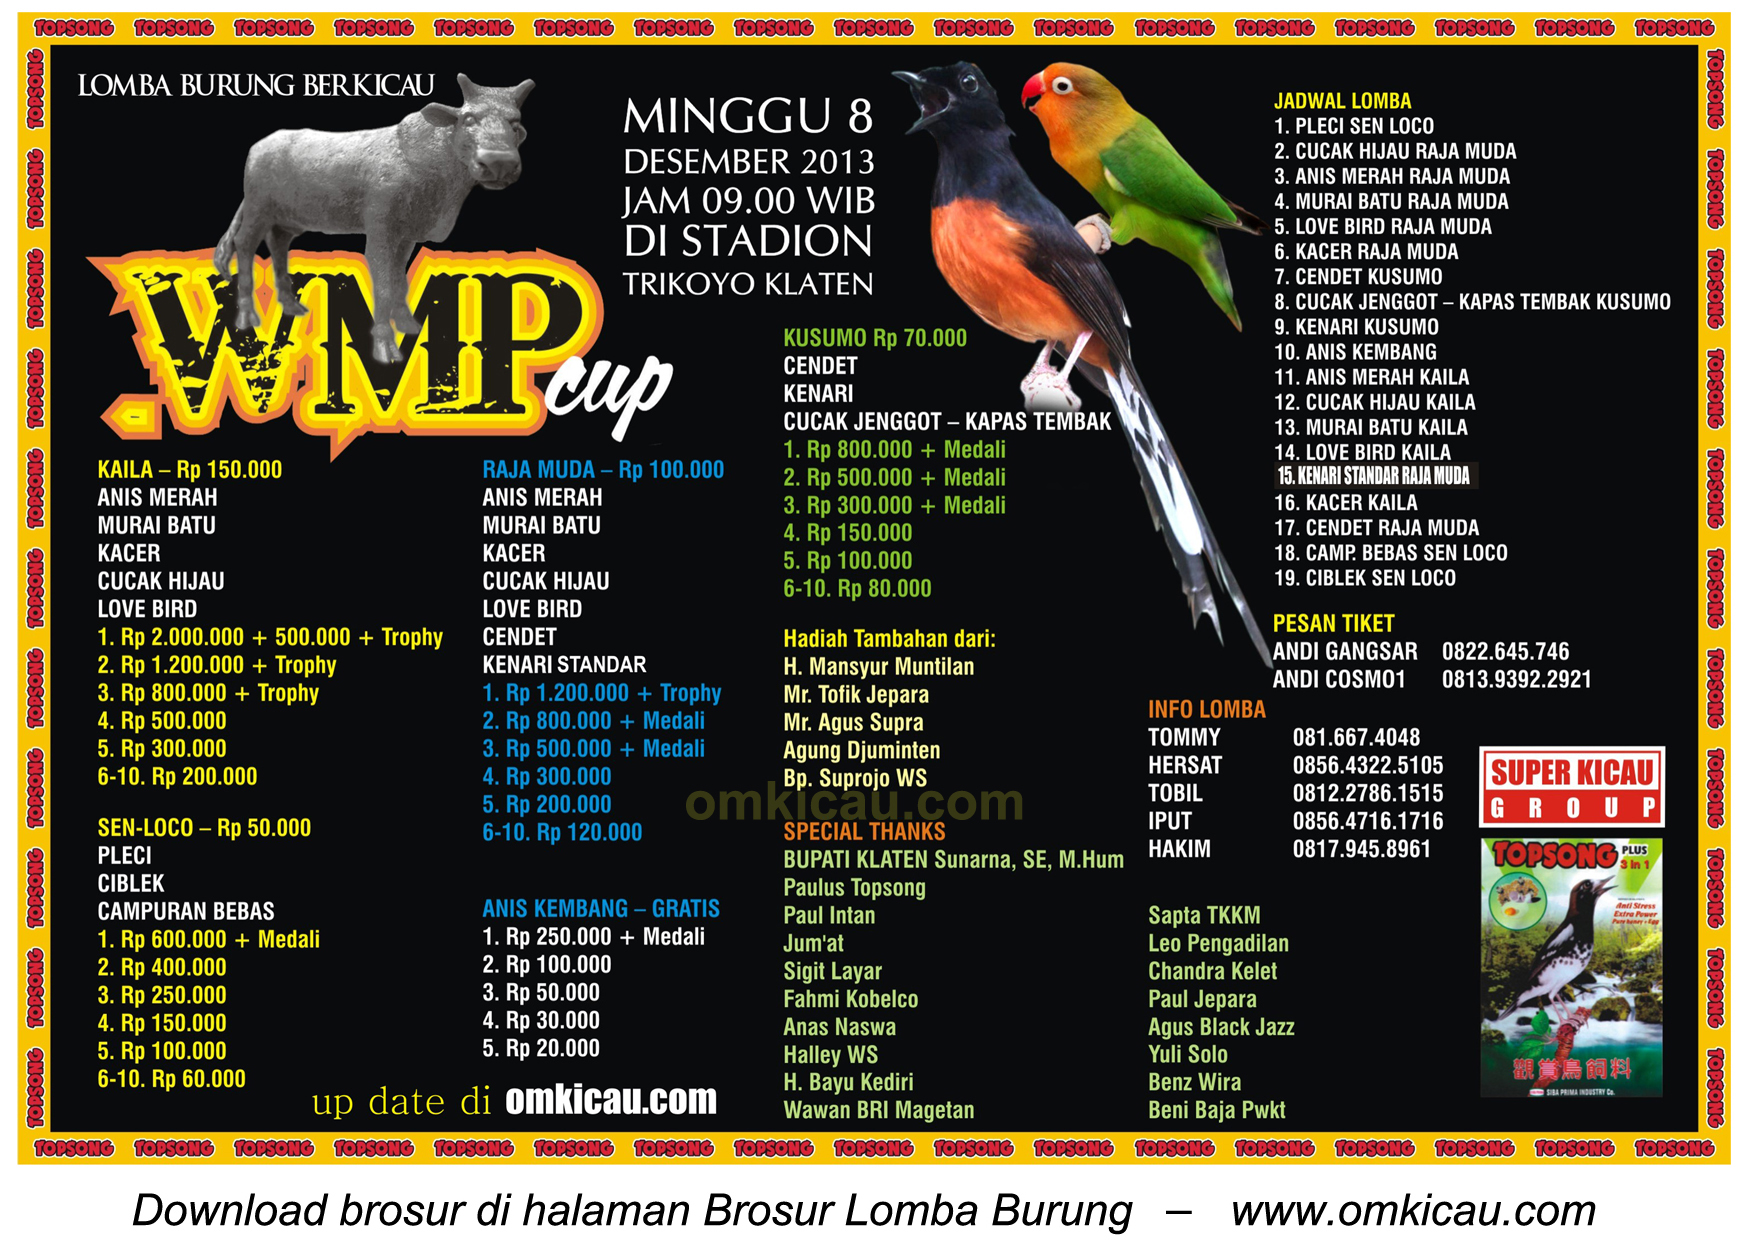 Brosur Lomba Burung Berkicau WMP Cup, Klaten, 8 Desember 2013